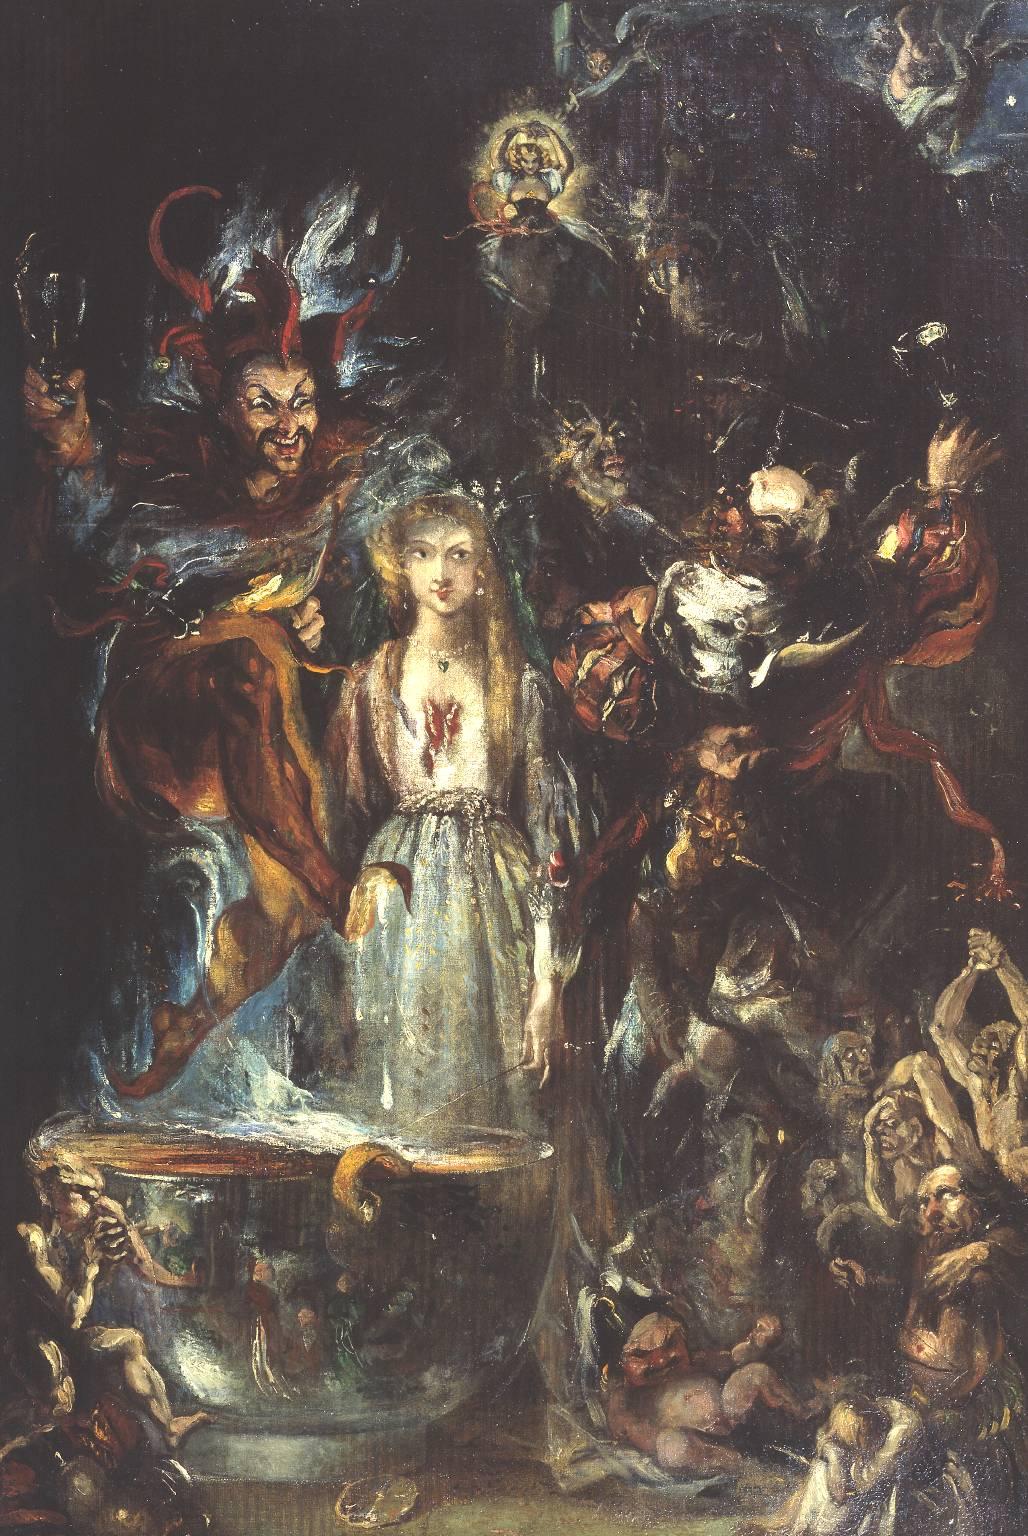 Theodor von Holst - Fantasy Based on Goethe's 'Faust' 1834